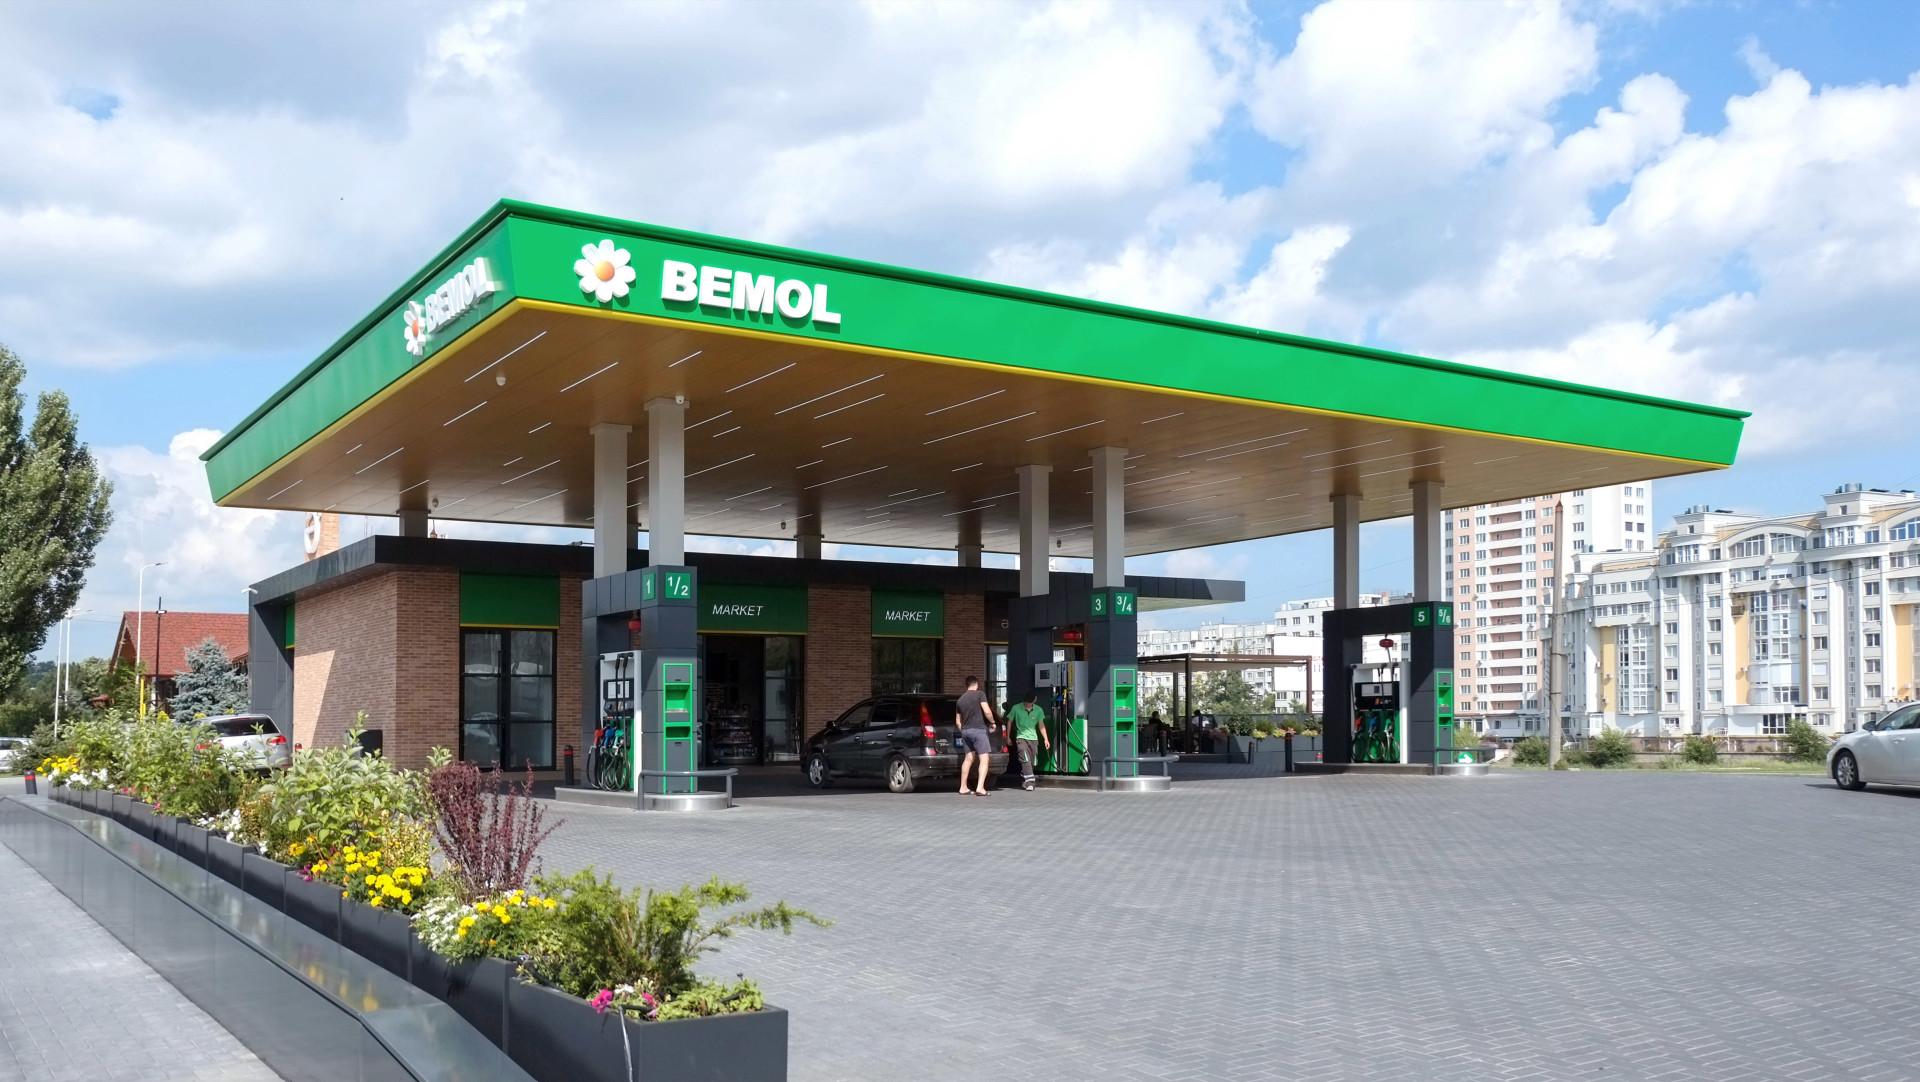 Wisp-Bemol-gas-station-exterior-general-view